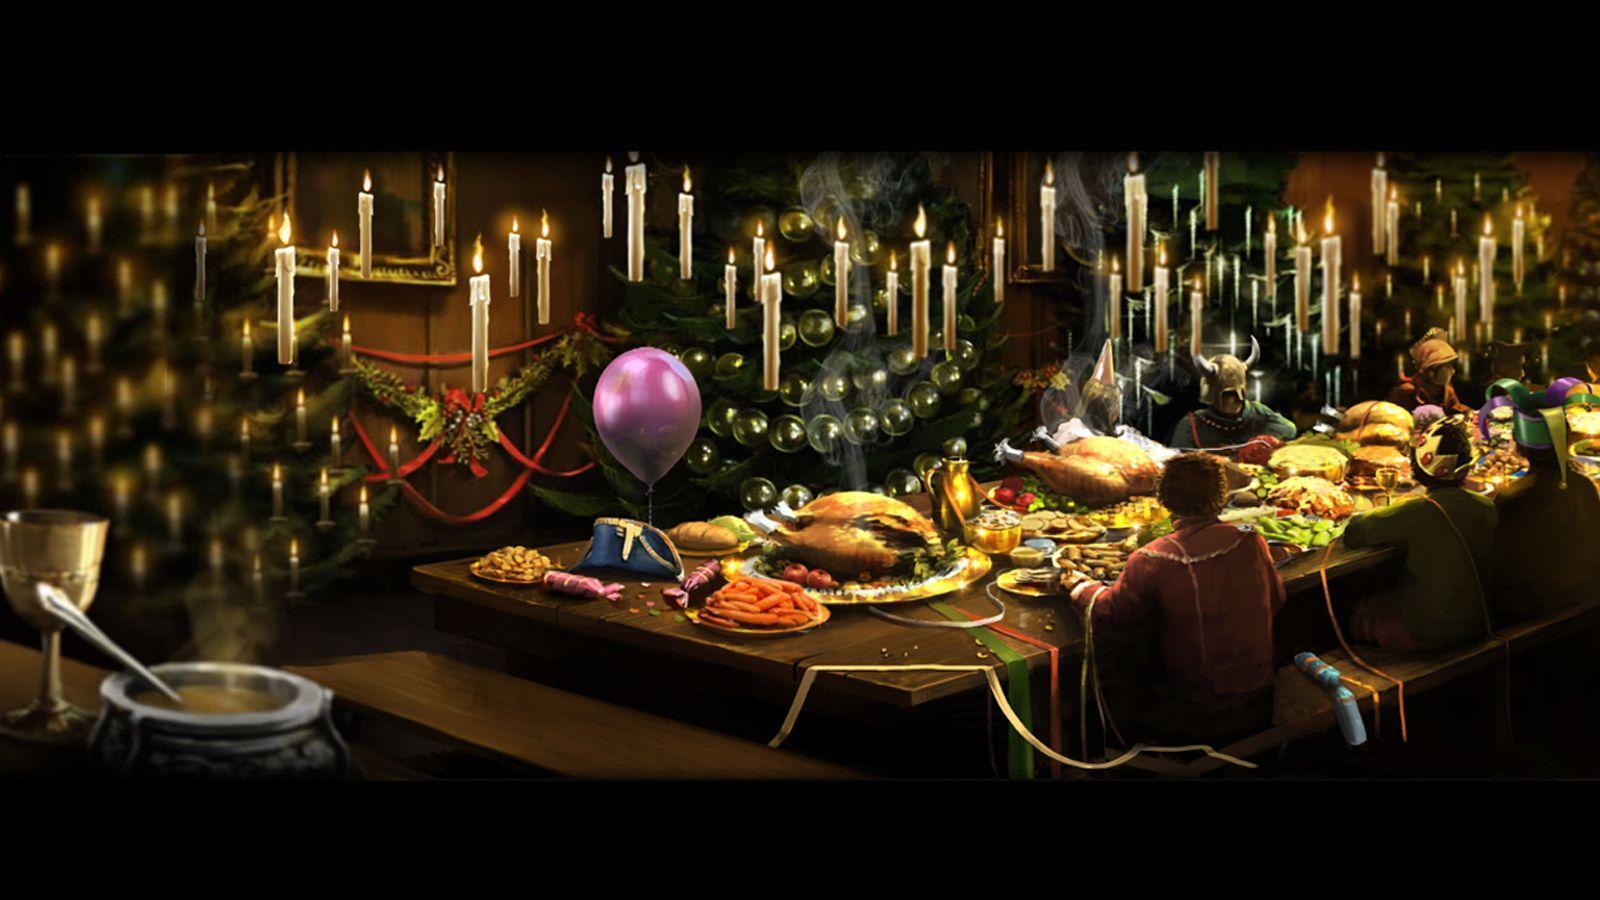 Popular Wallpaper Harry Potter Pottermore - wp1863594  Image_691924.jpg